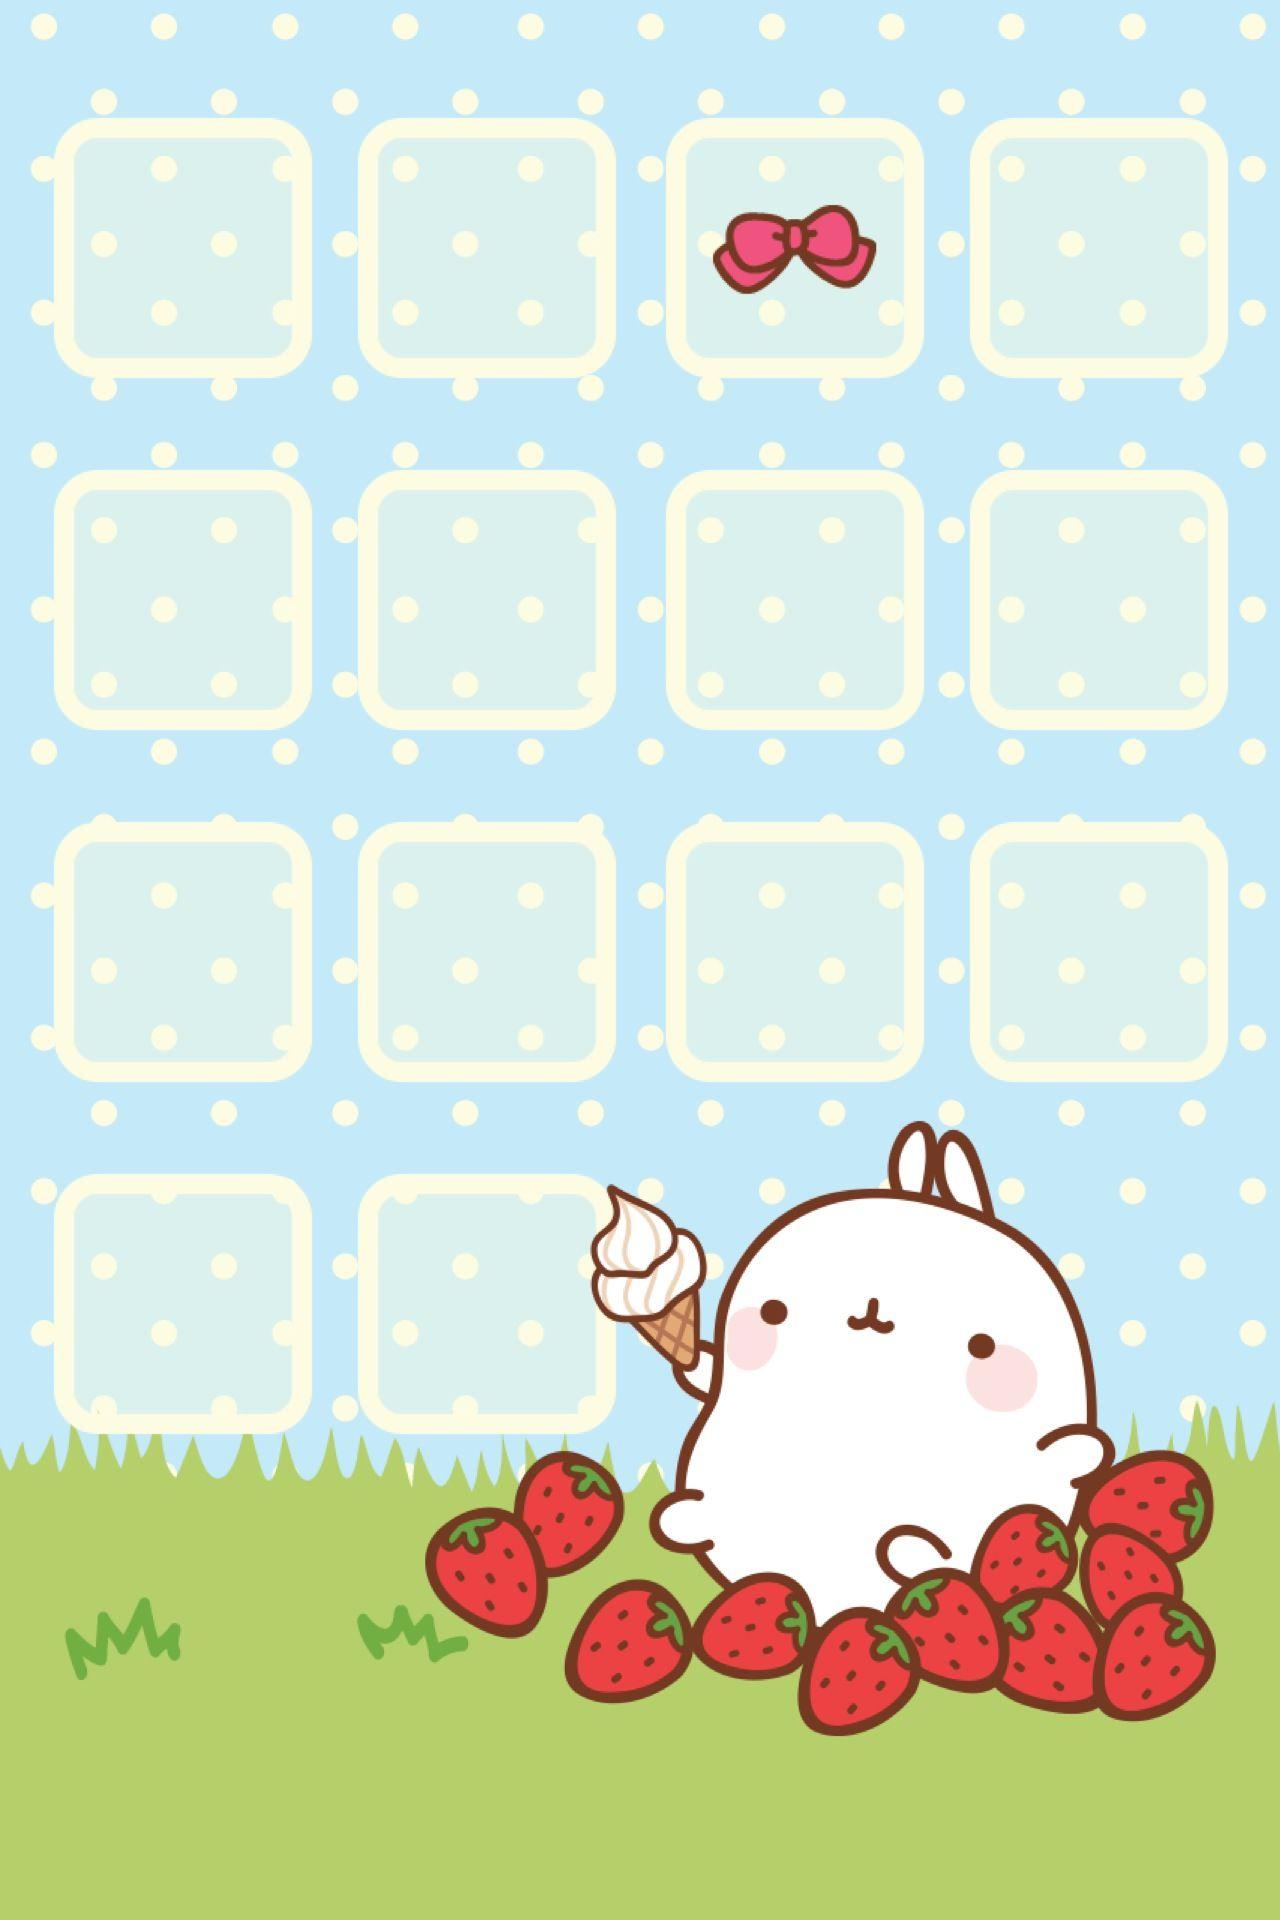 Kawaii iphone wallpaper tumblr - Search Results For Kawaii Wallpapers For Iphone Adorable Wallpapers